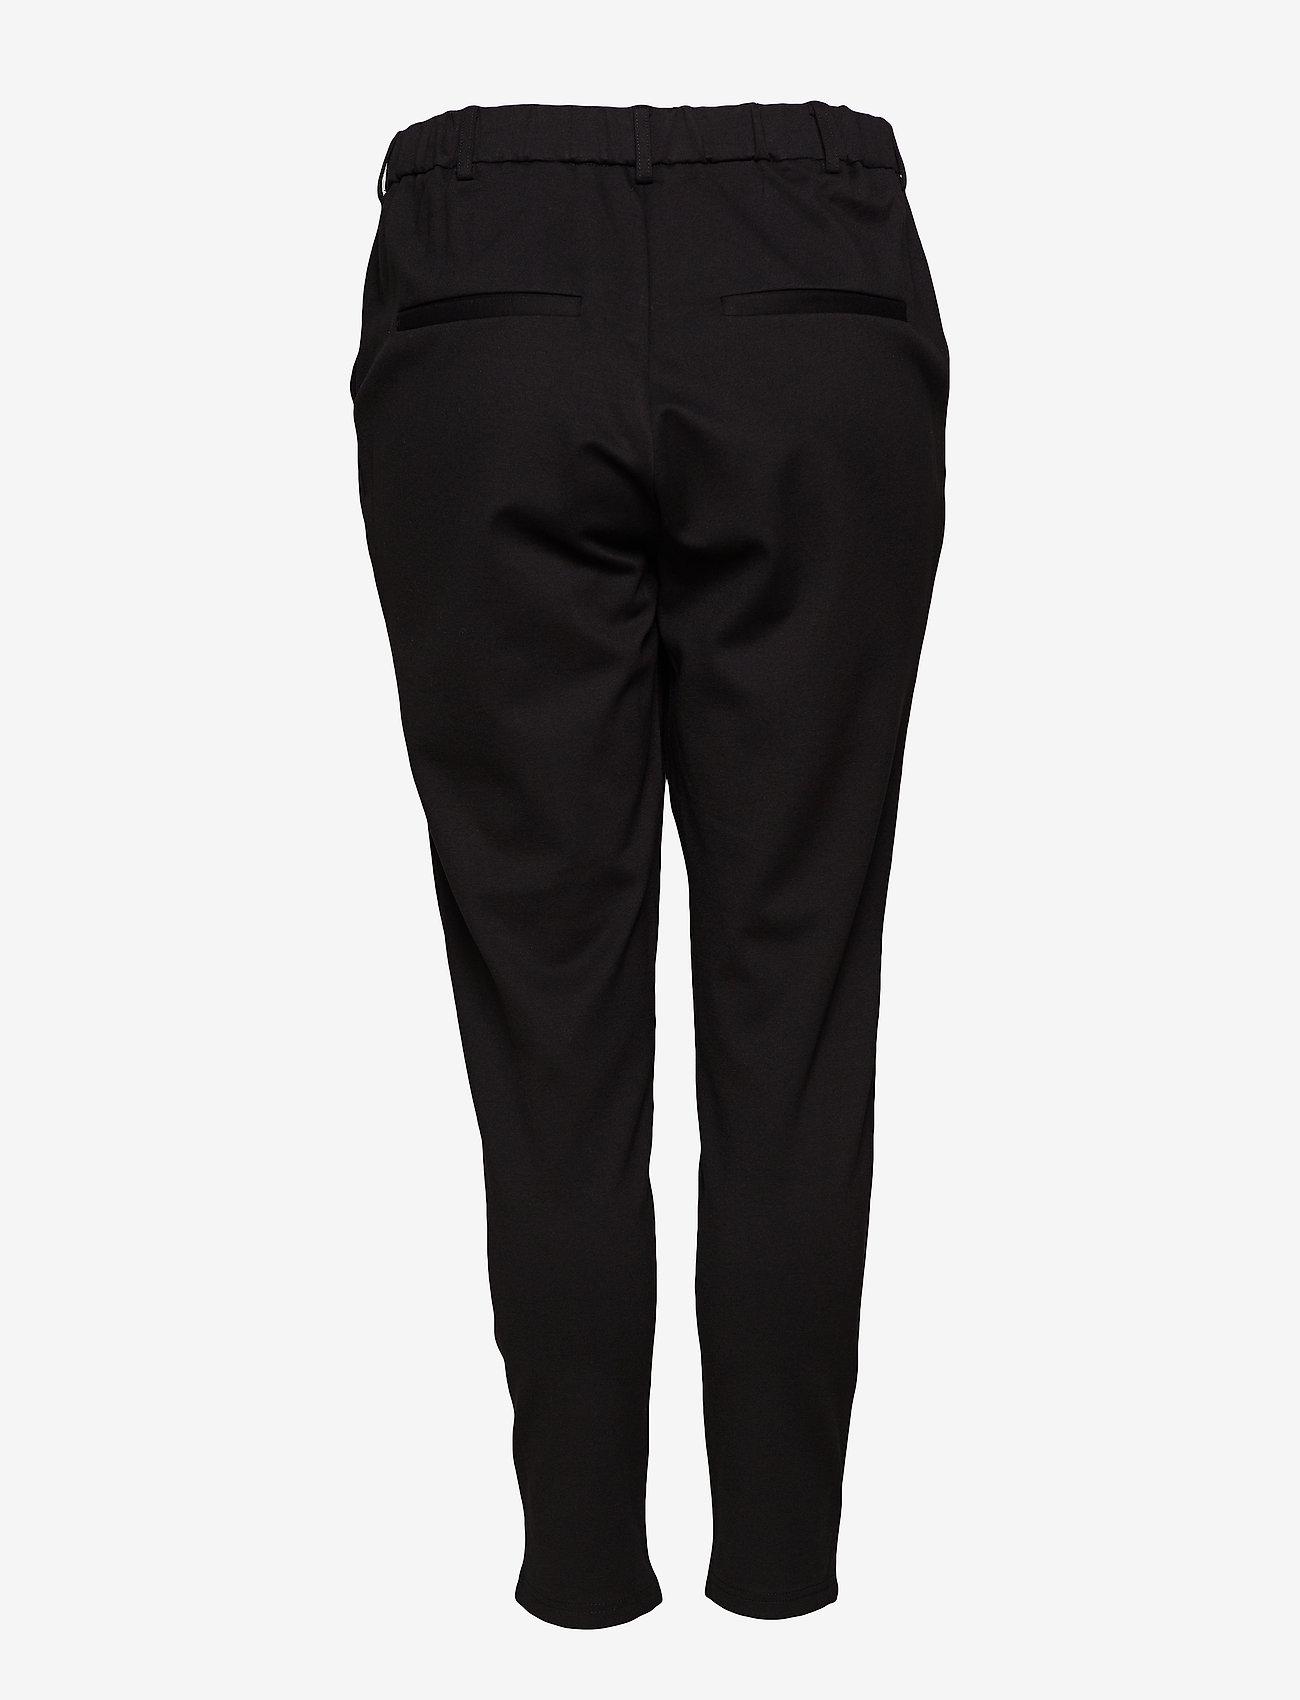 Zizzi ZMaddison, cropped, pant - Hosen BLACK - Damen Kleidung